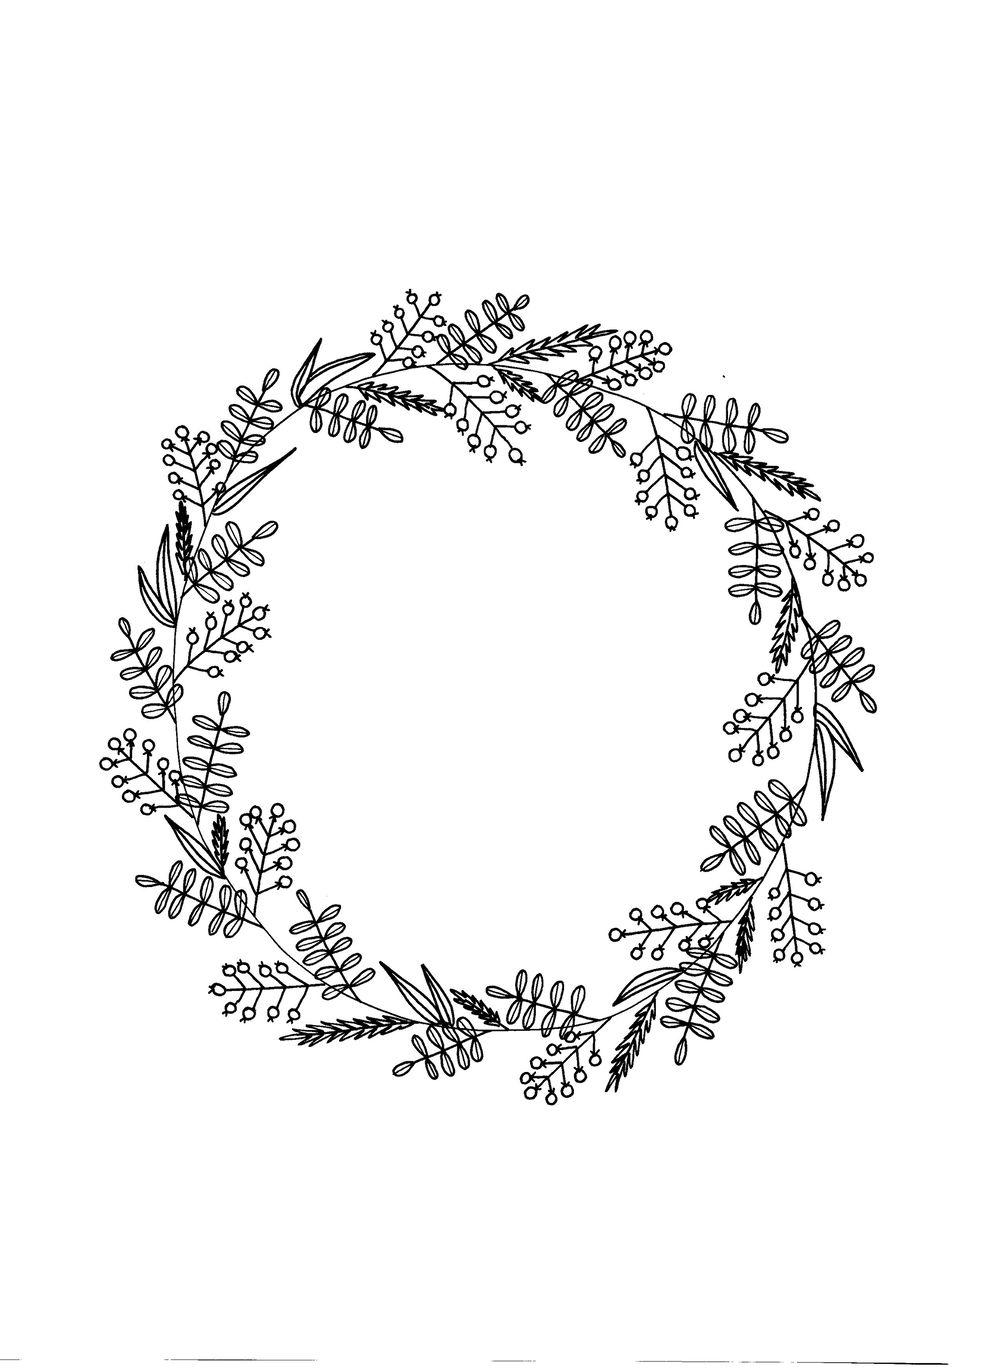 flower and leaf doodles - image 4 - student project